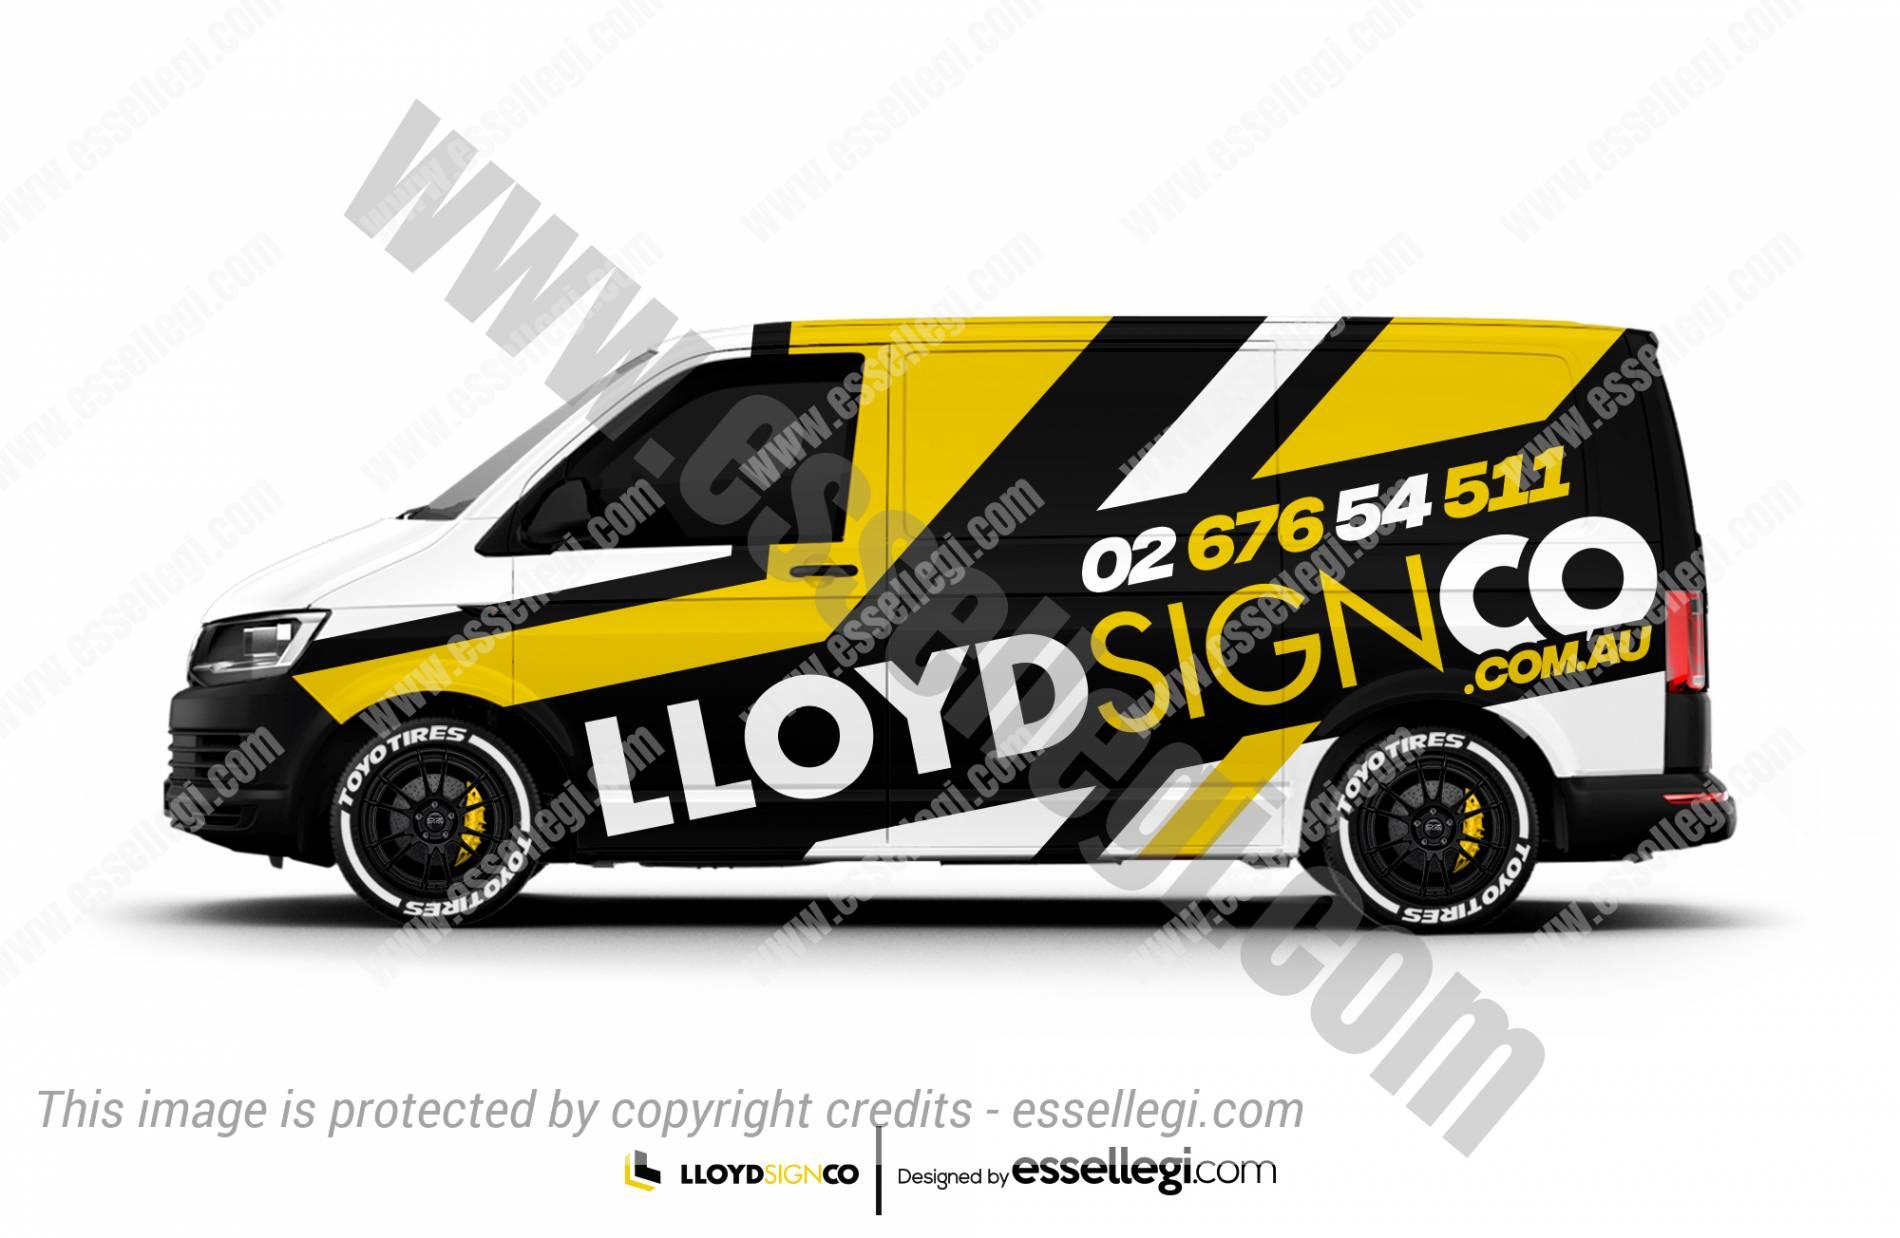 LLOYD SIGN CO. | VAN WRAP DESIGN 🇦🇺